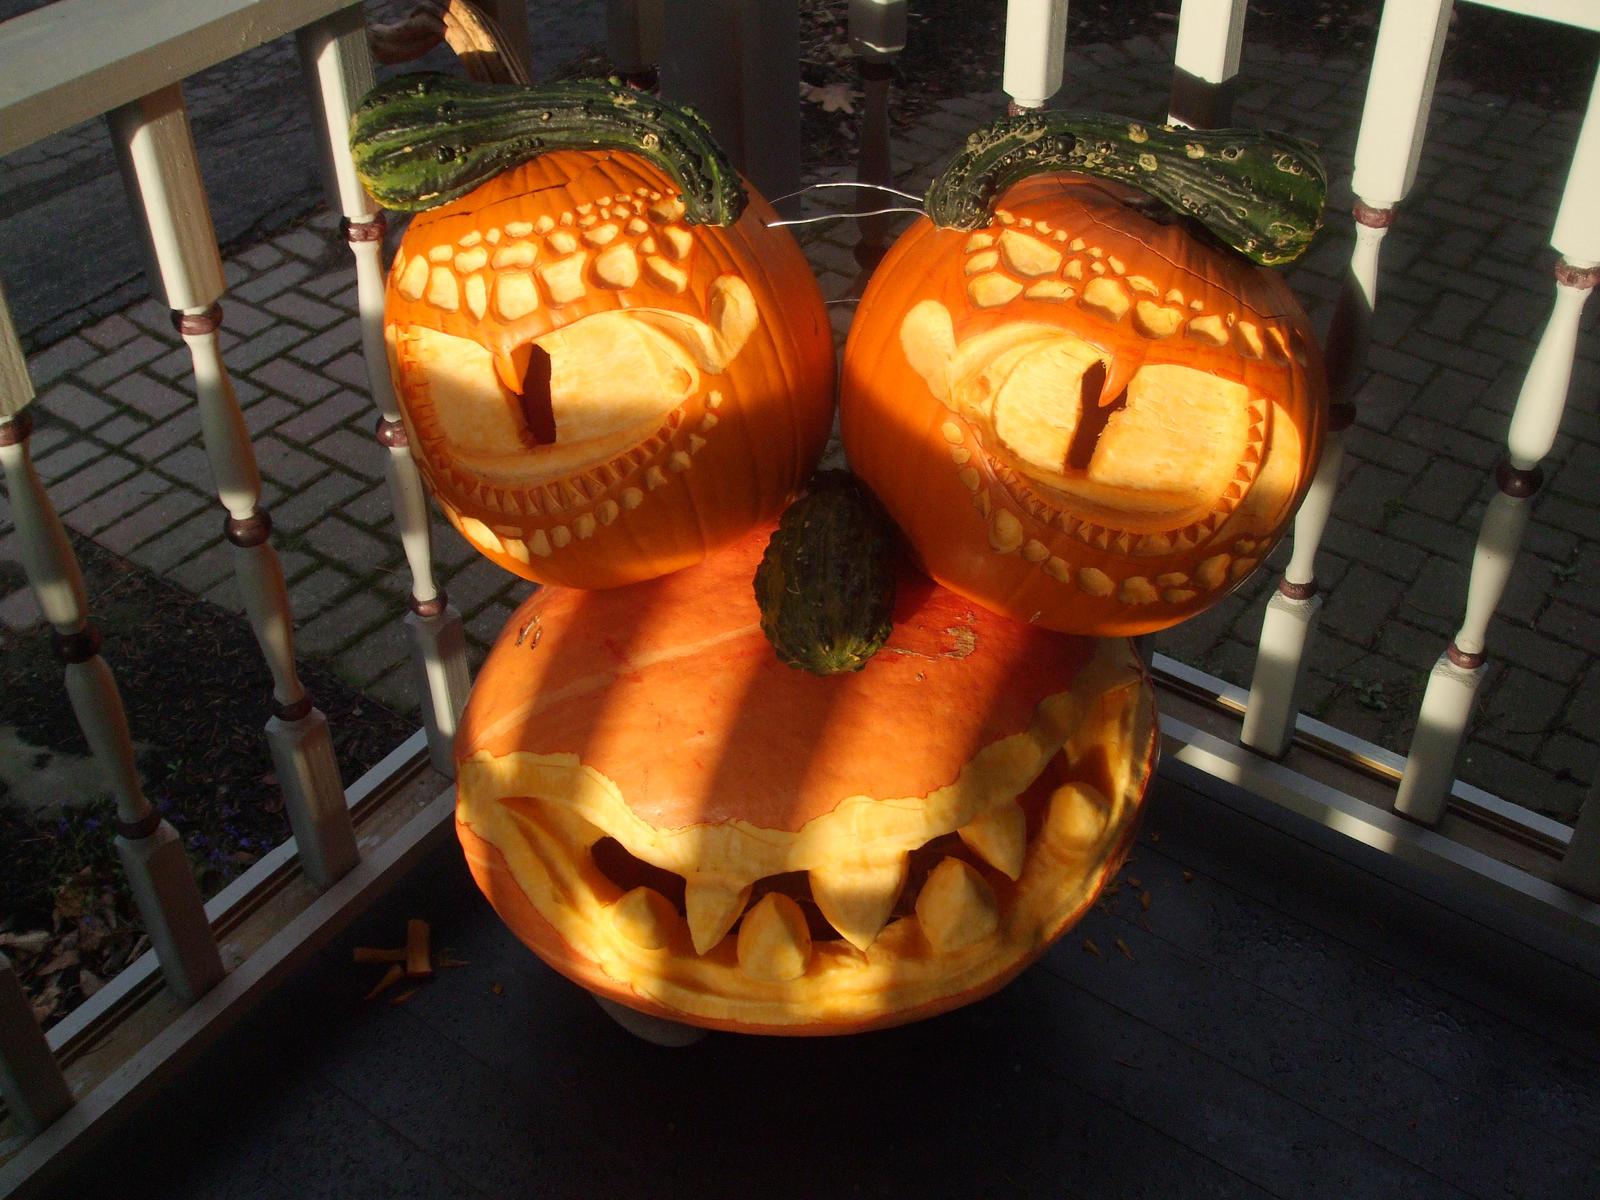 Monster Pumpkin 1 by BAC-of-all-trades on DeviantArt